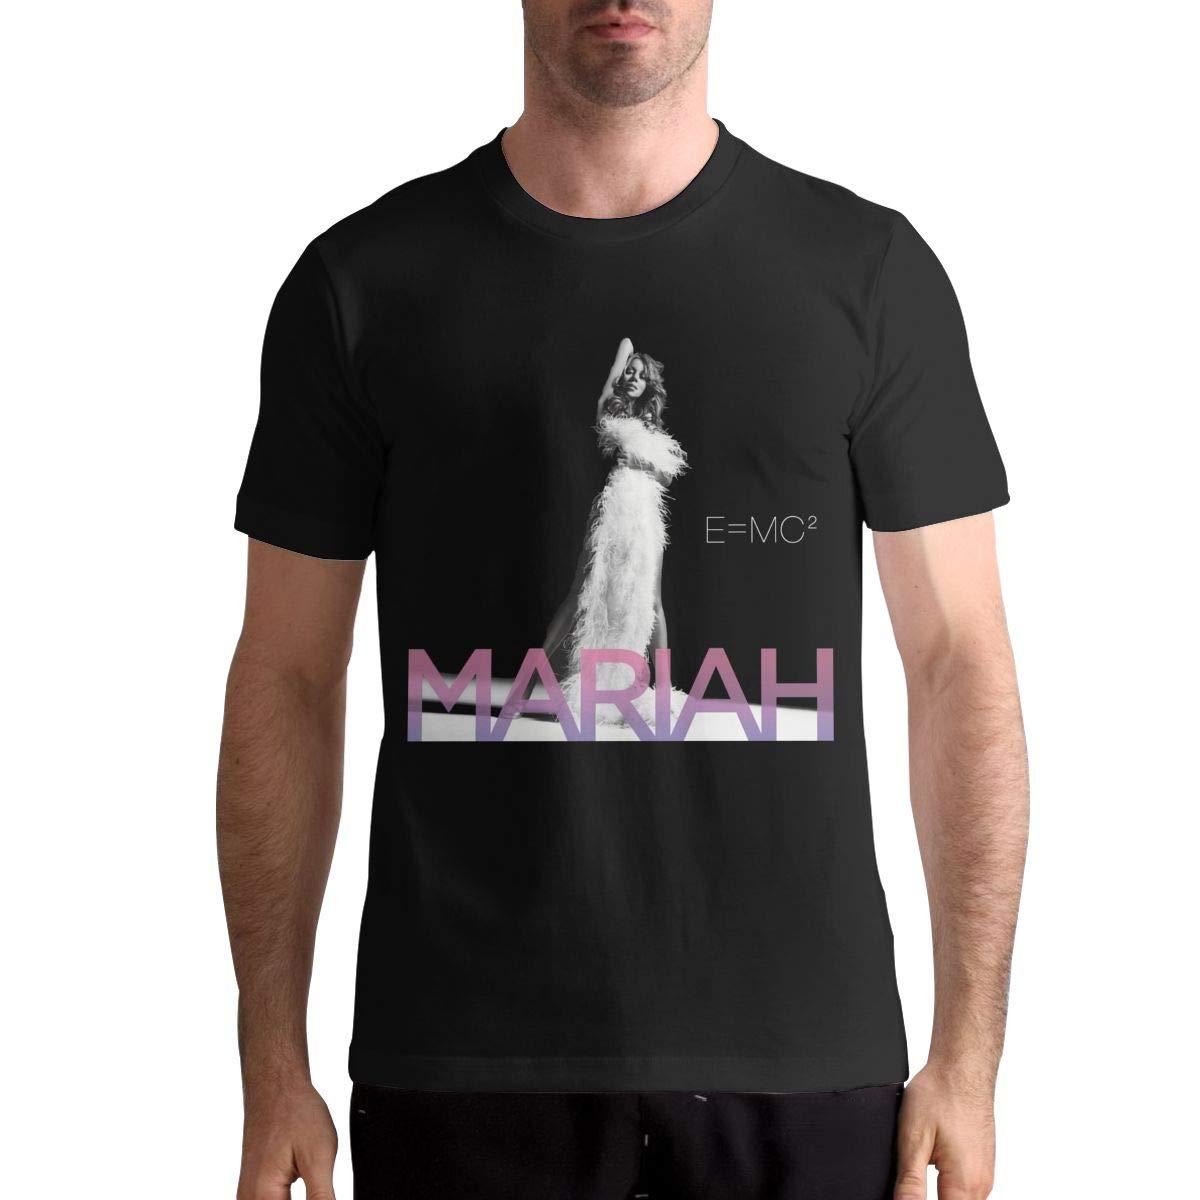 Mariah Carey Handsome Plus Shor 5847 Shirts